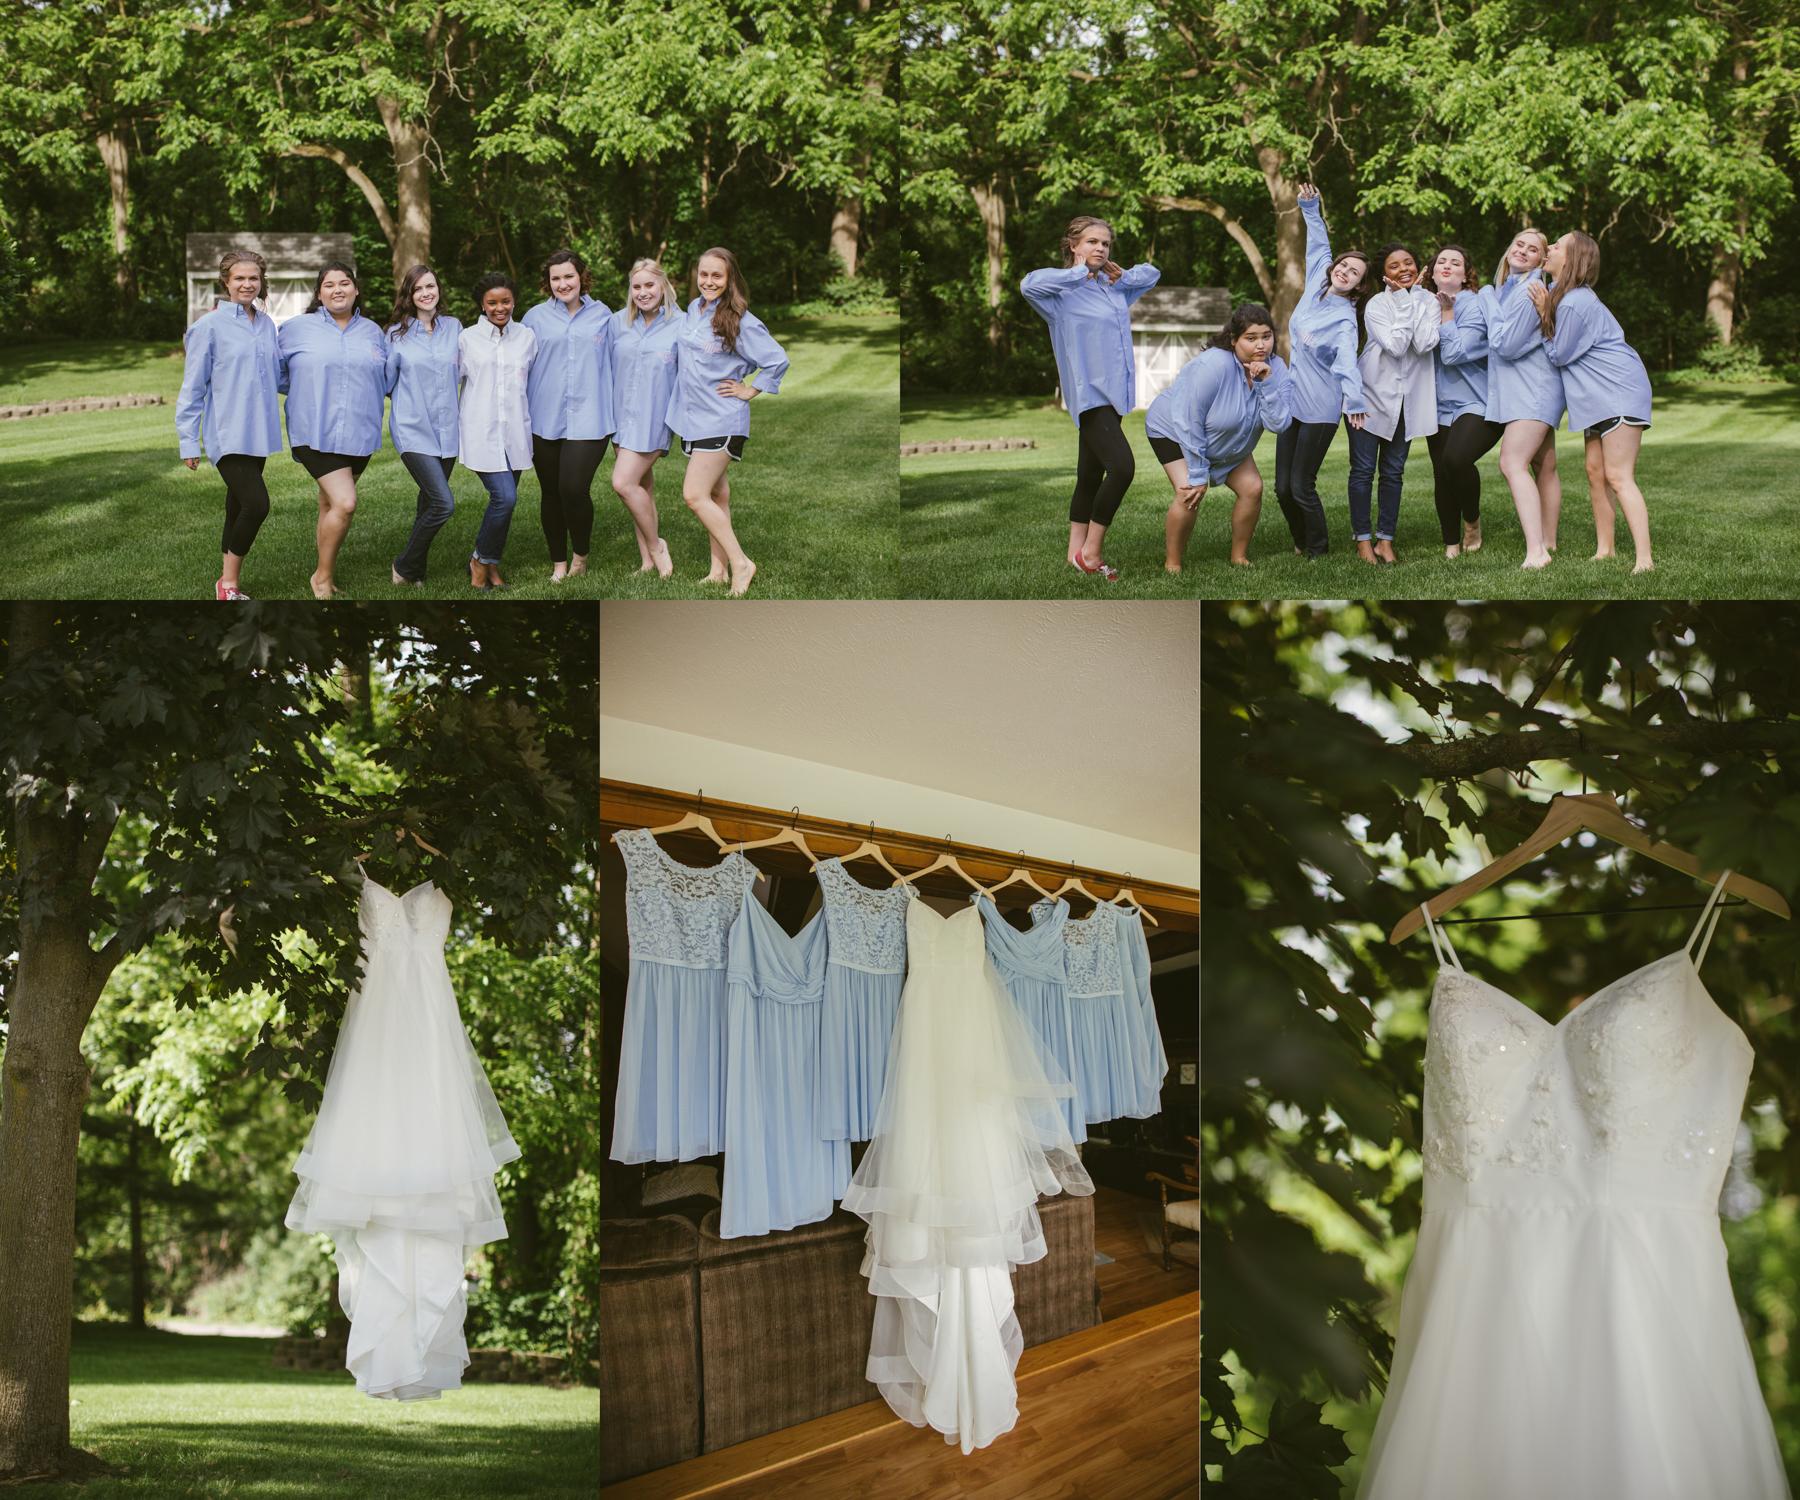 005 may-jimmy-notre-dame-wedding.jpg